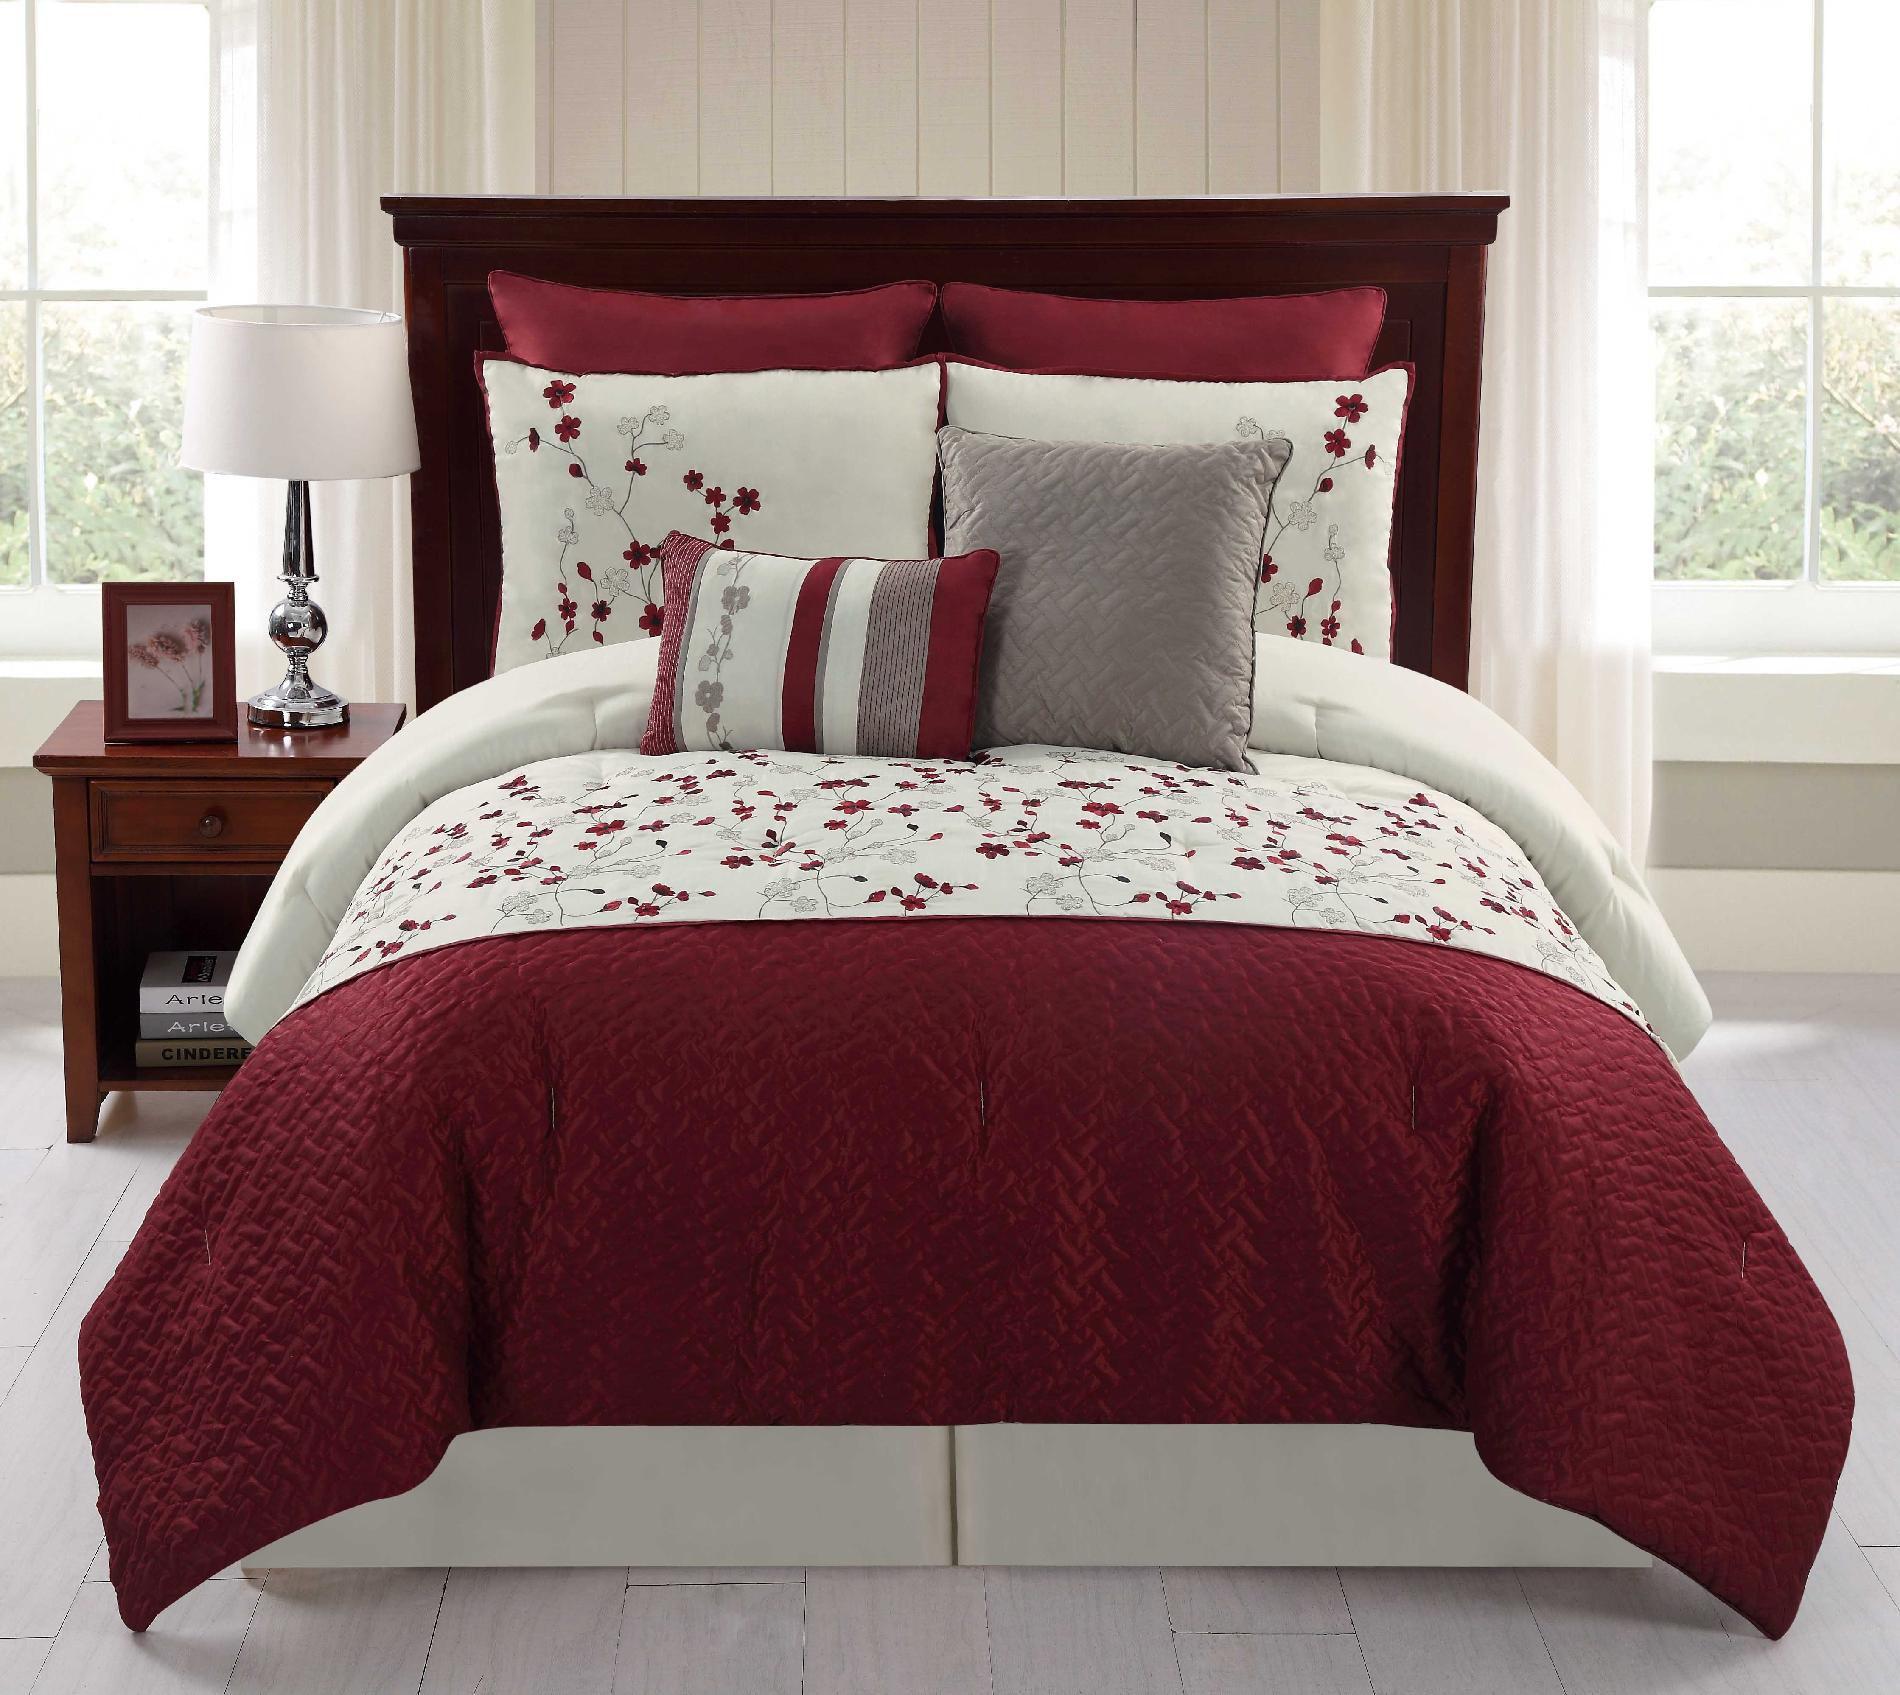 8Piece Embroidered Comforter Set  Sadie